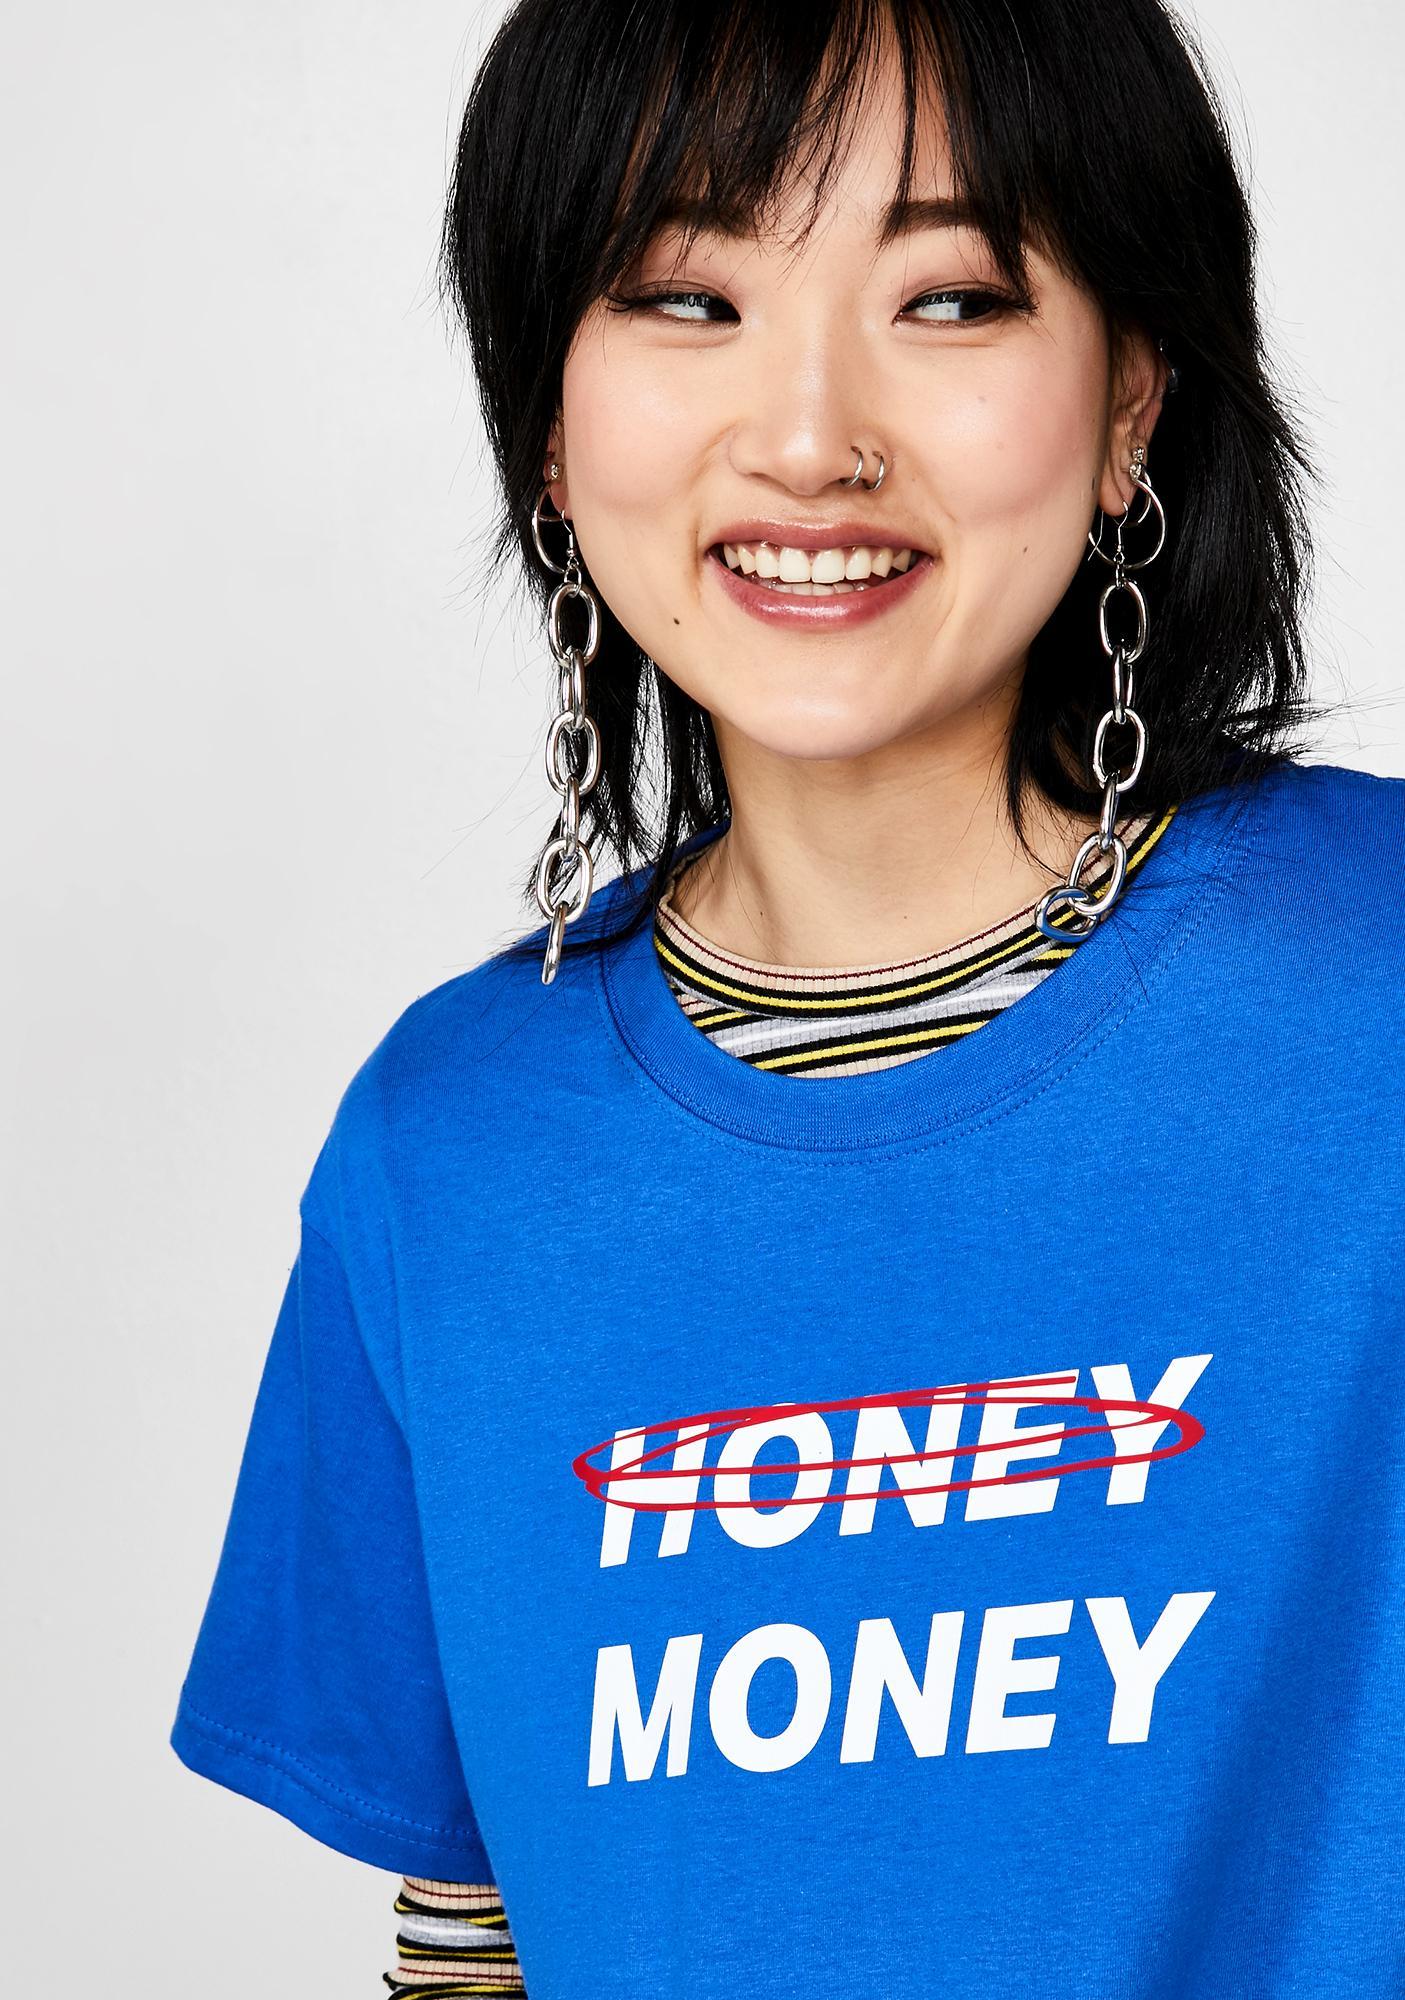 621aaf58a31 Minga Honey Money Oversized Tee